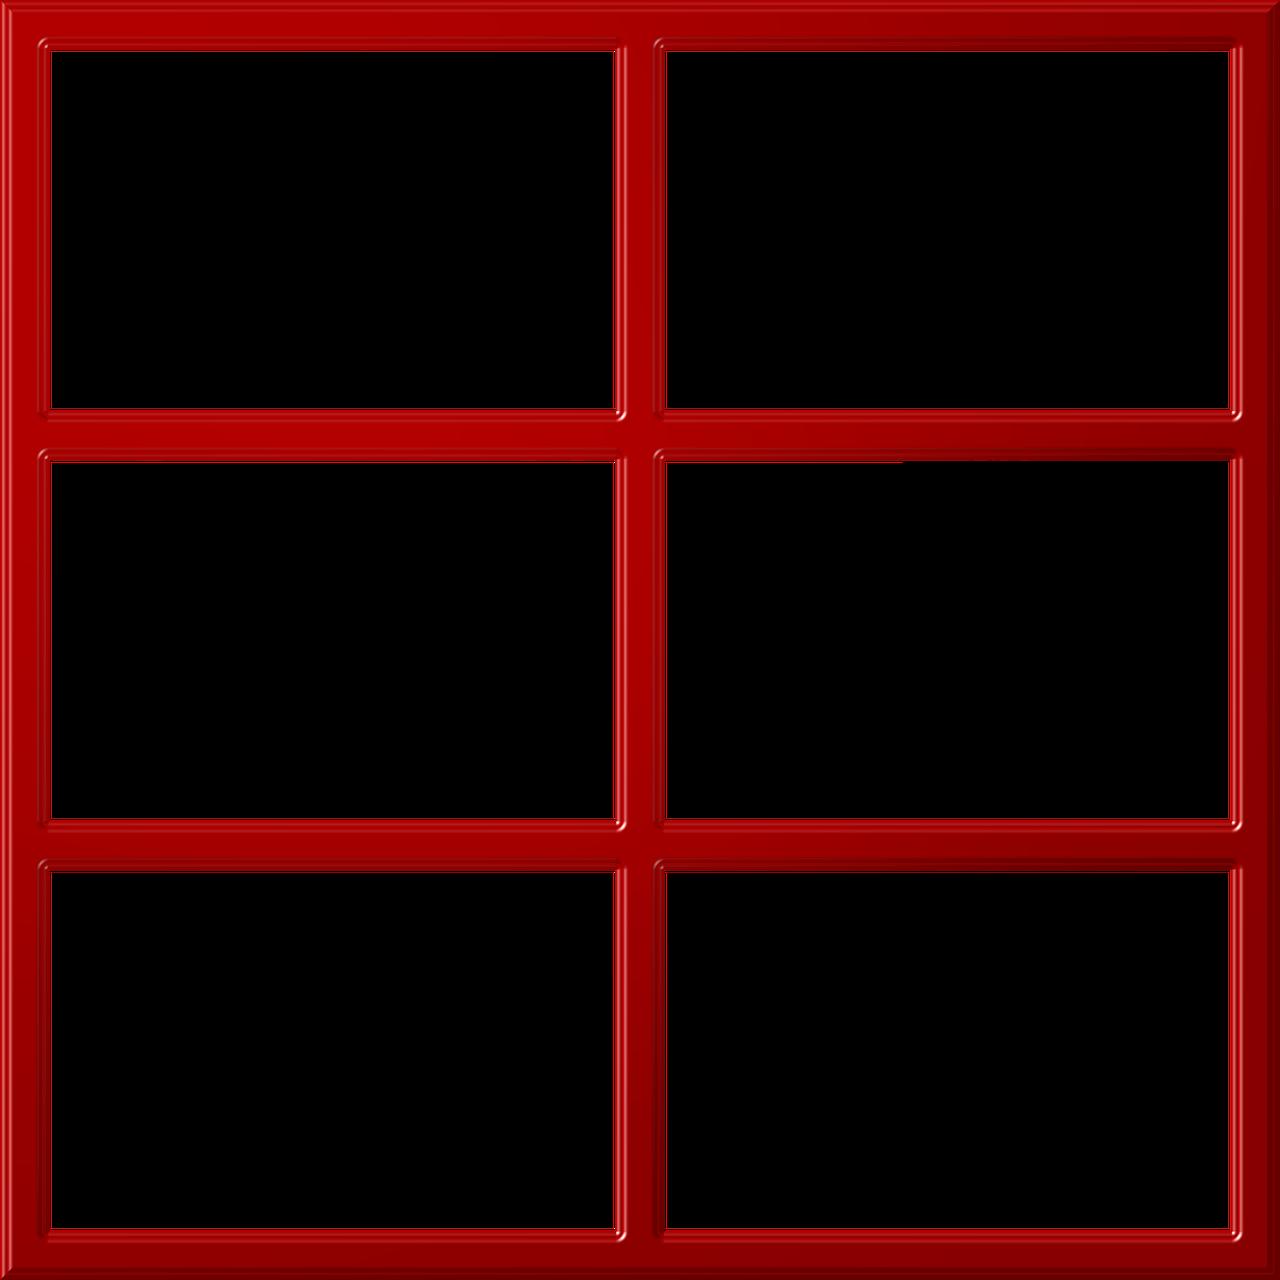 Red,frame,window,border,design - free photo from needpix.com